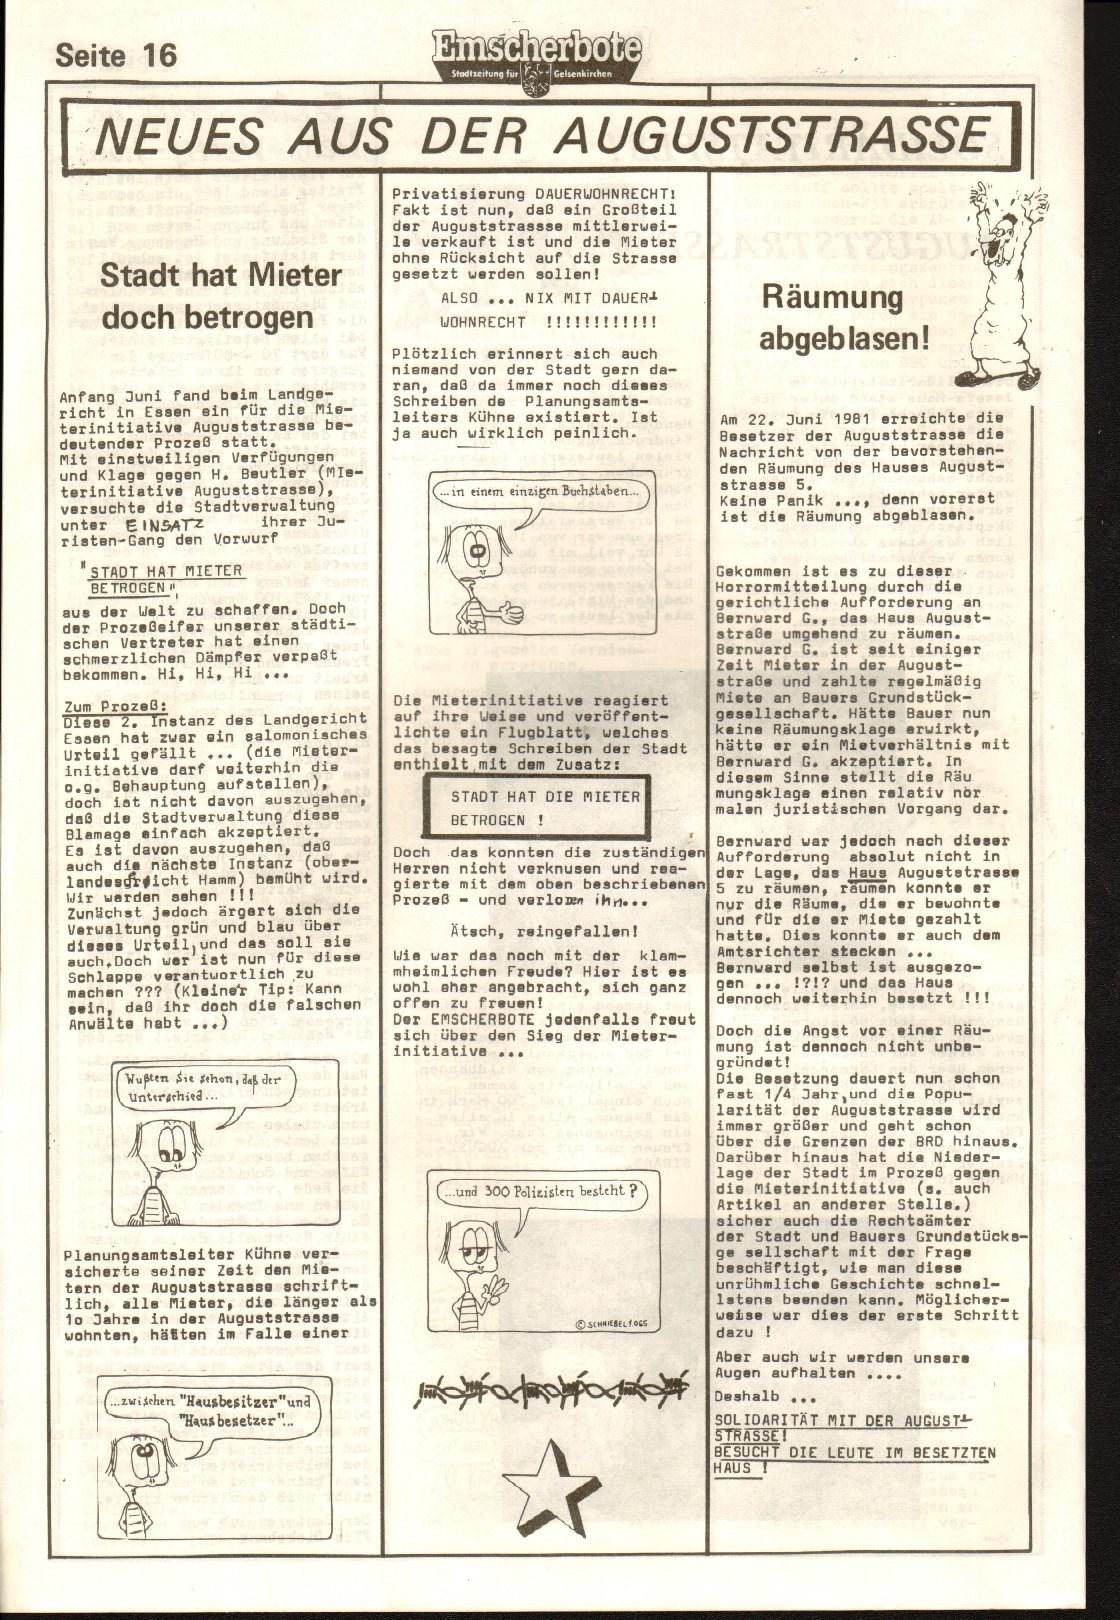 Gelsenkirchen_Emscherbote_1981_09_16